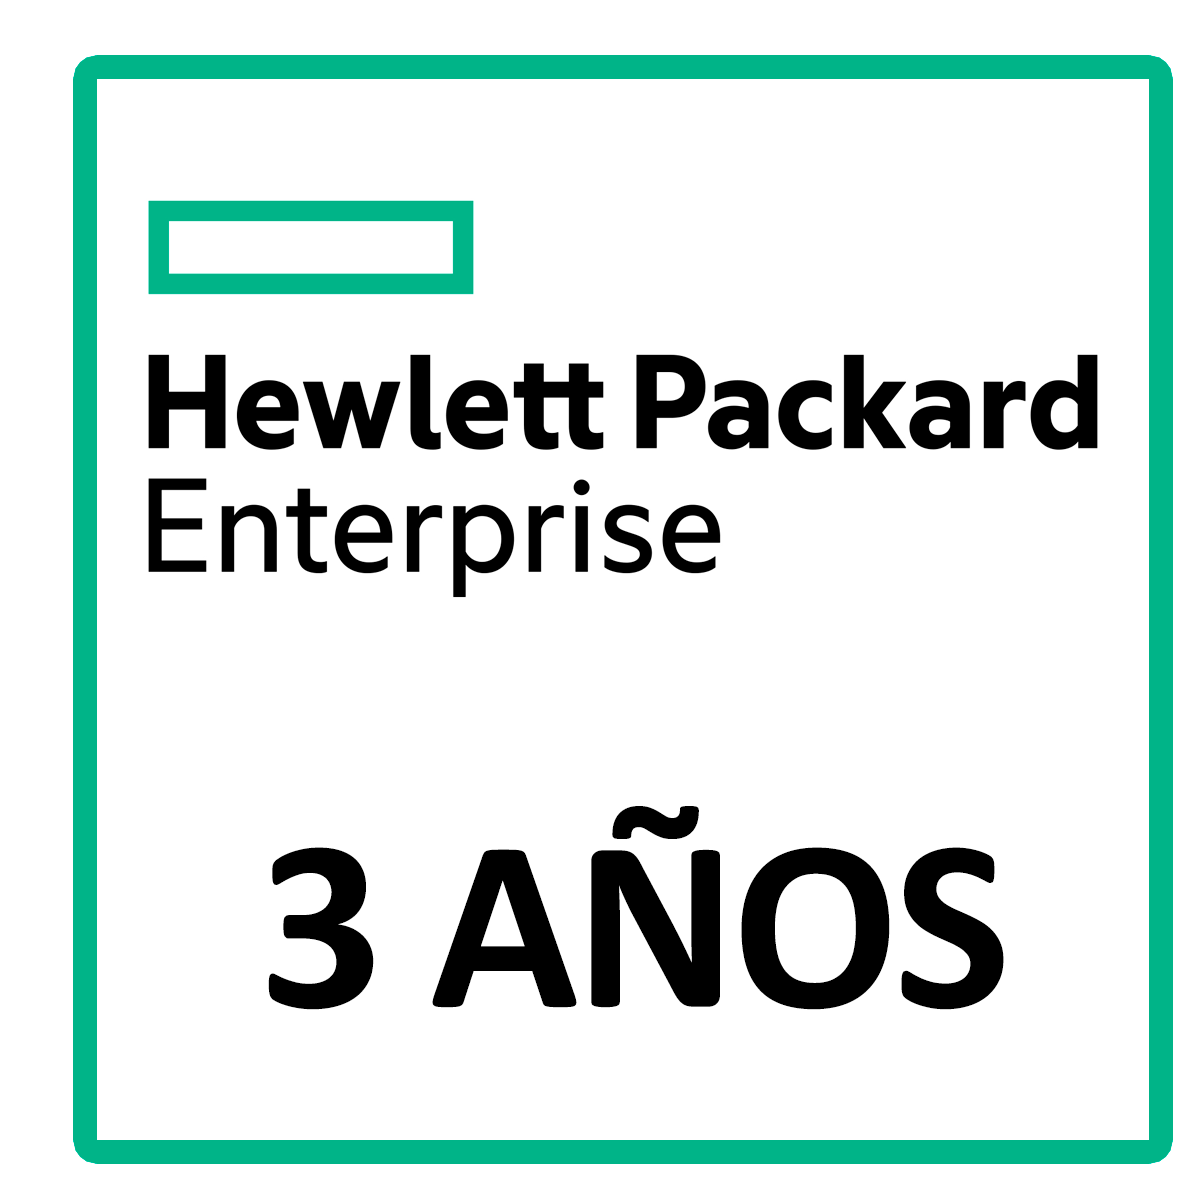 H8QP7E